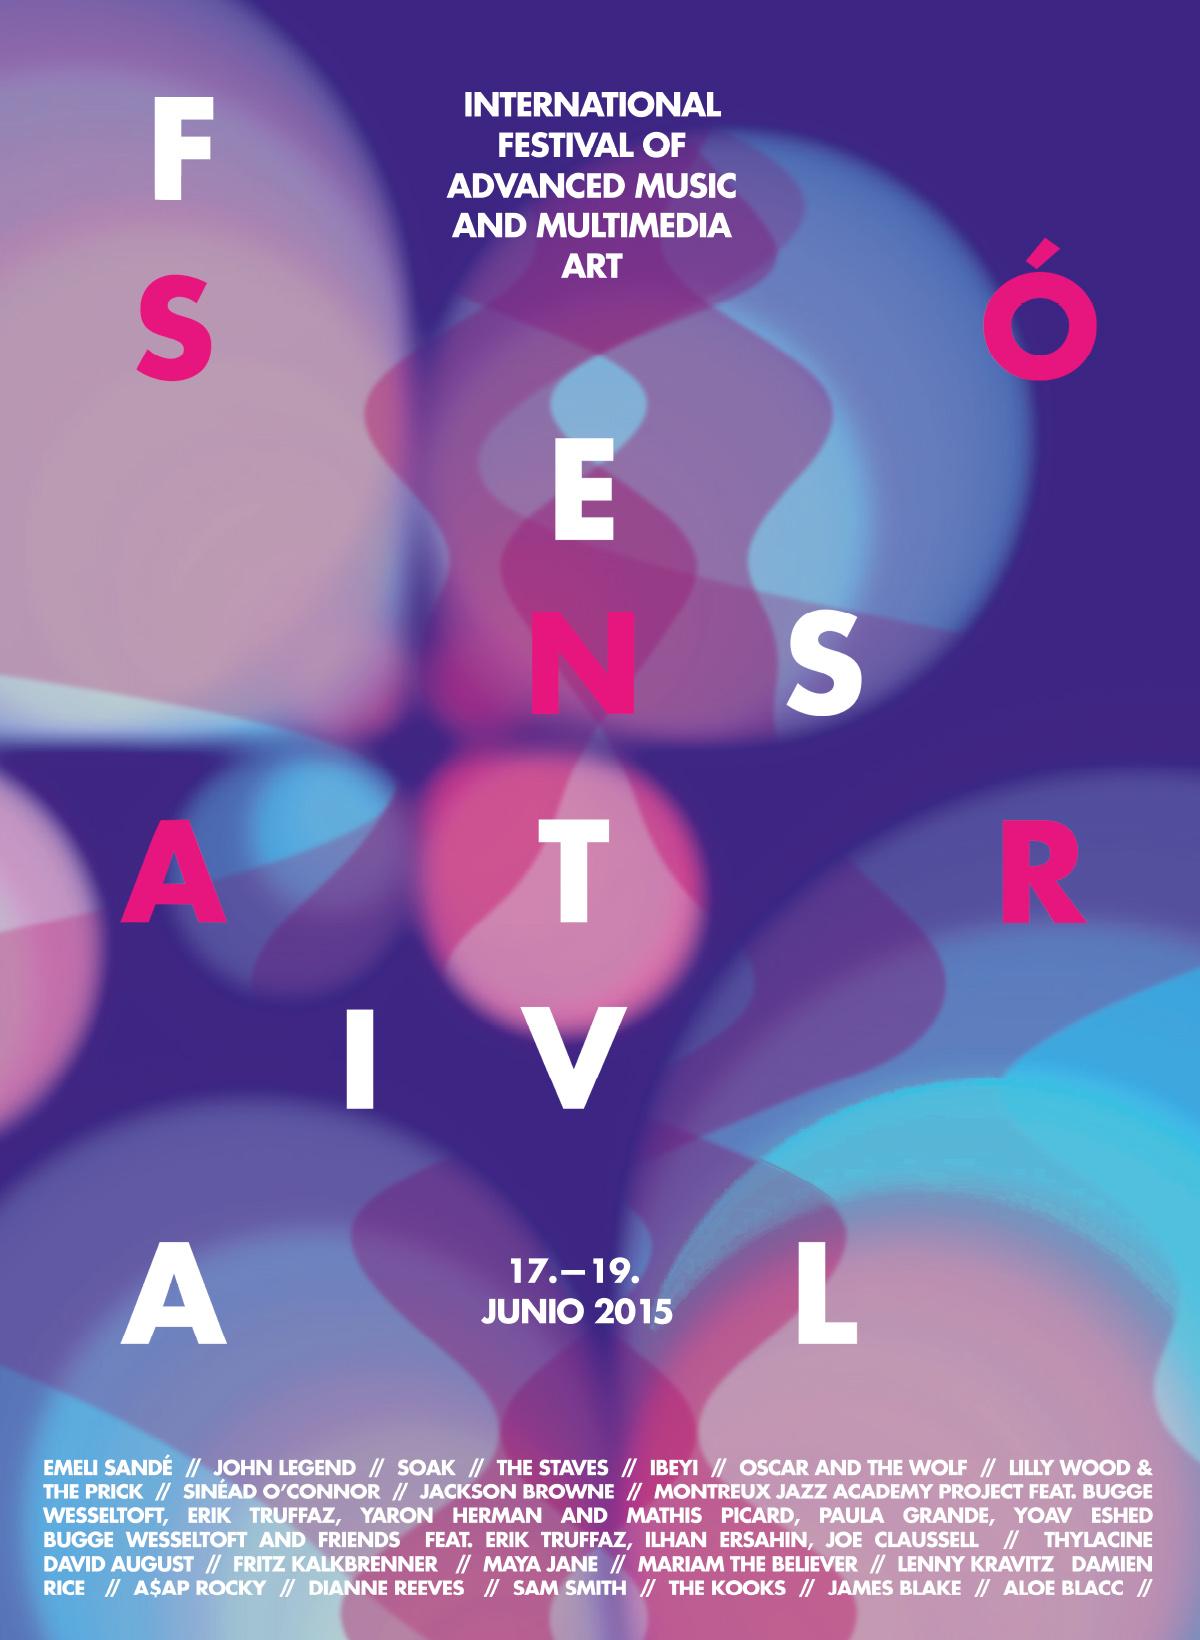 Alsterdamm_Plakat_Sonar-Festival_Vincent-Bueker_01